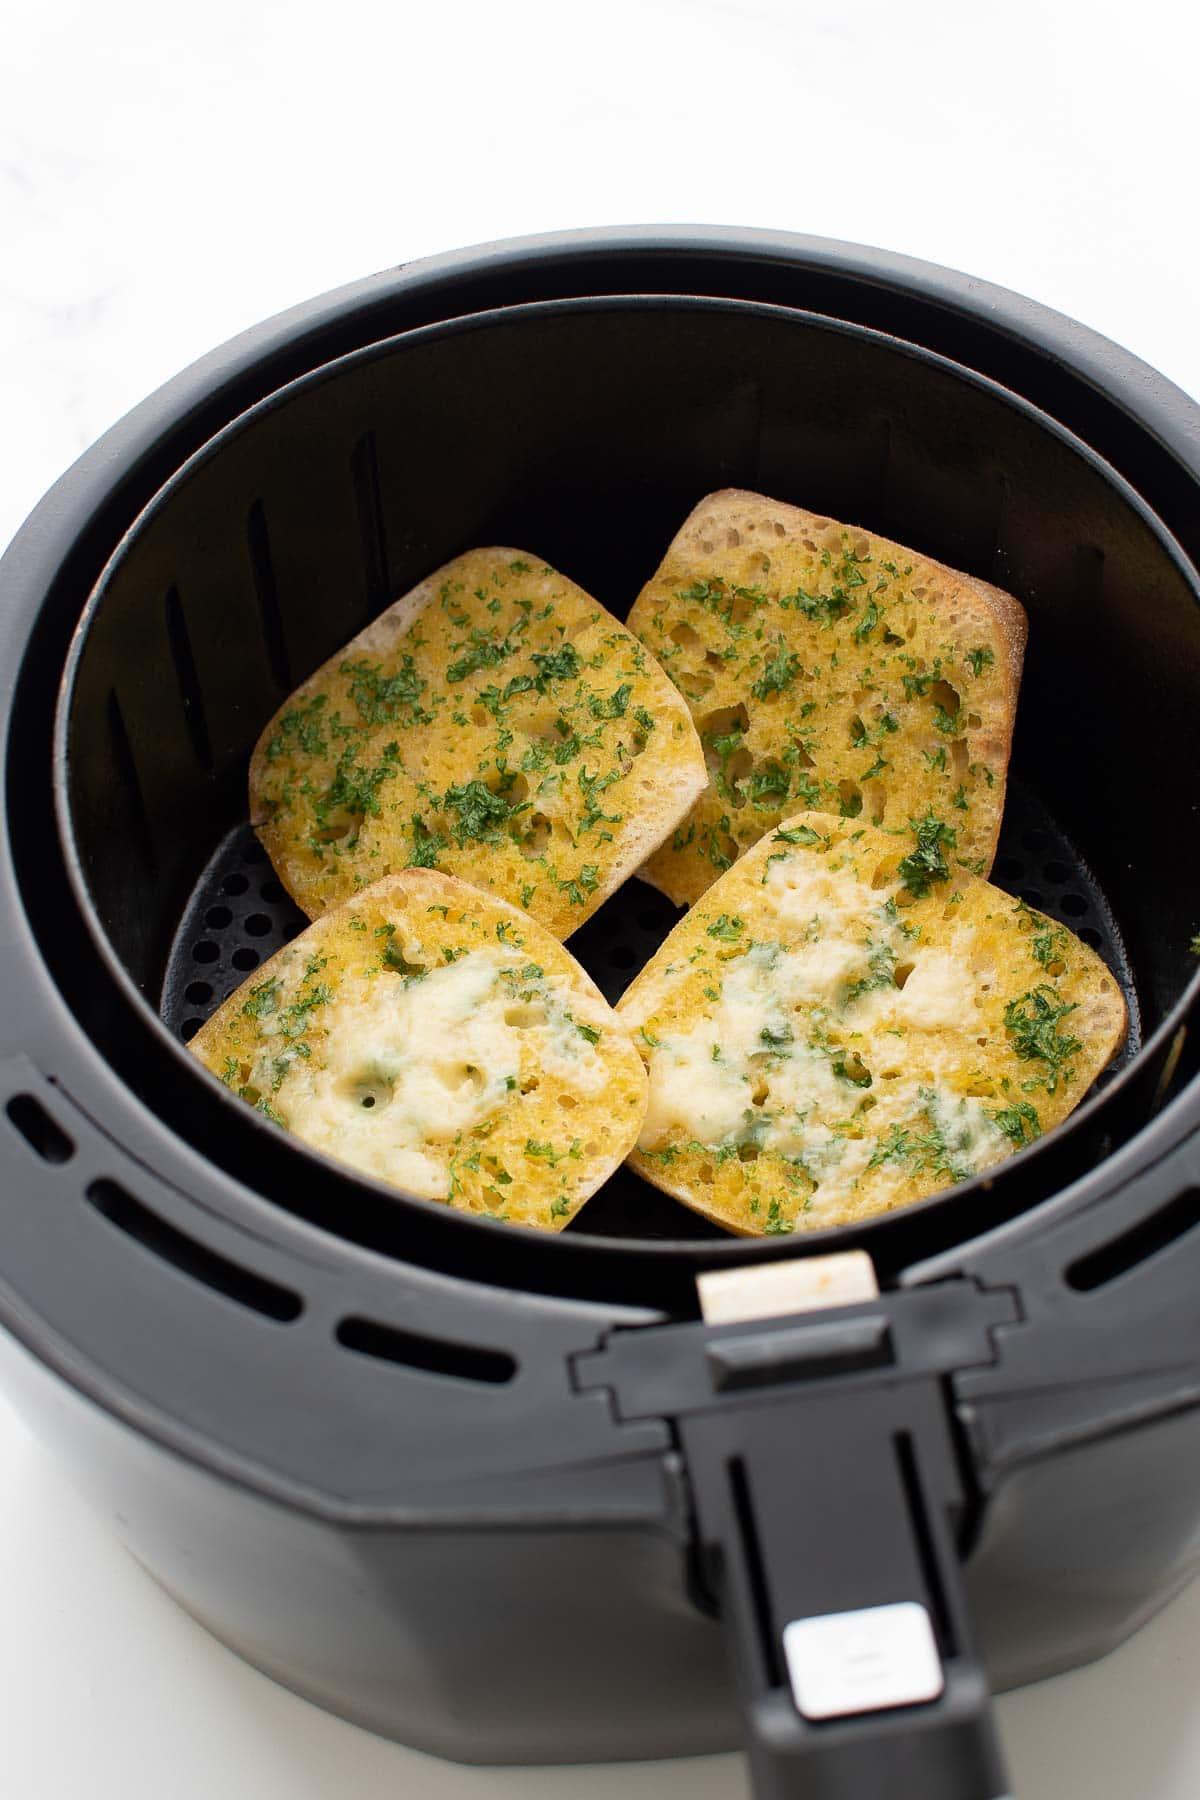 Air fried garlic bread with parsley.